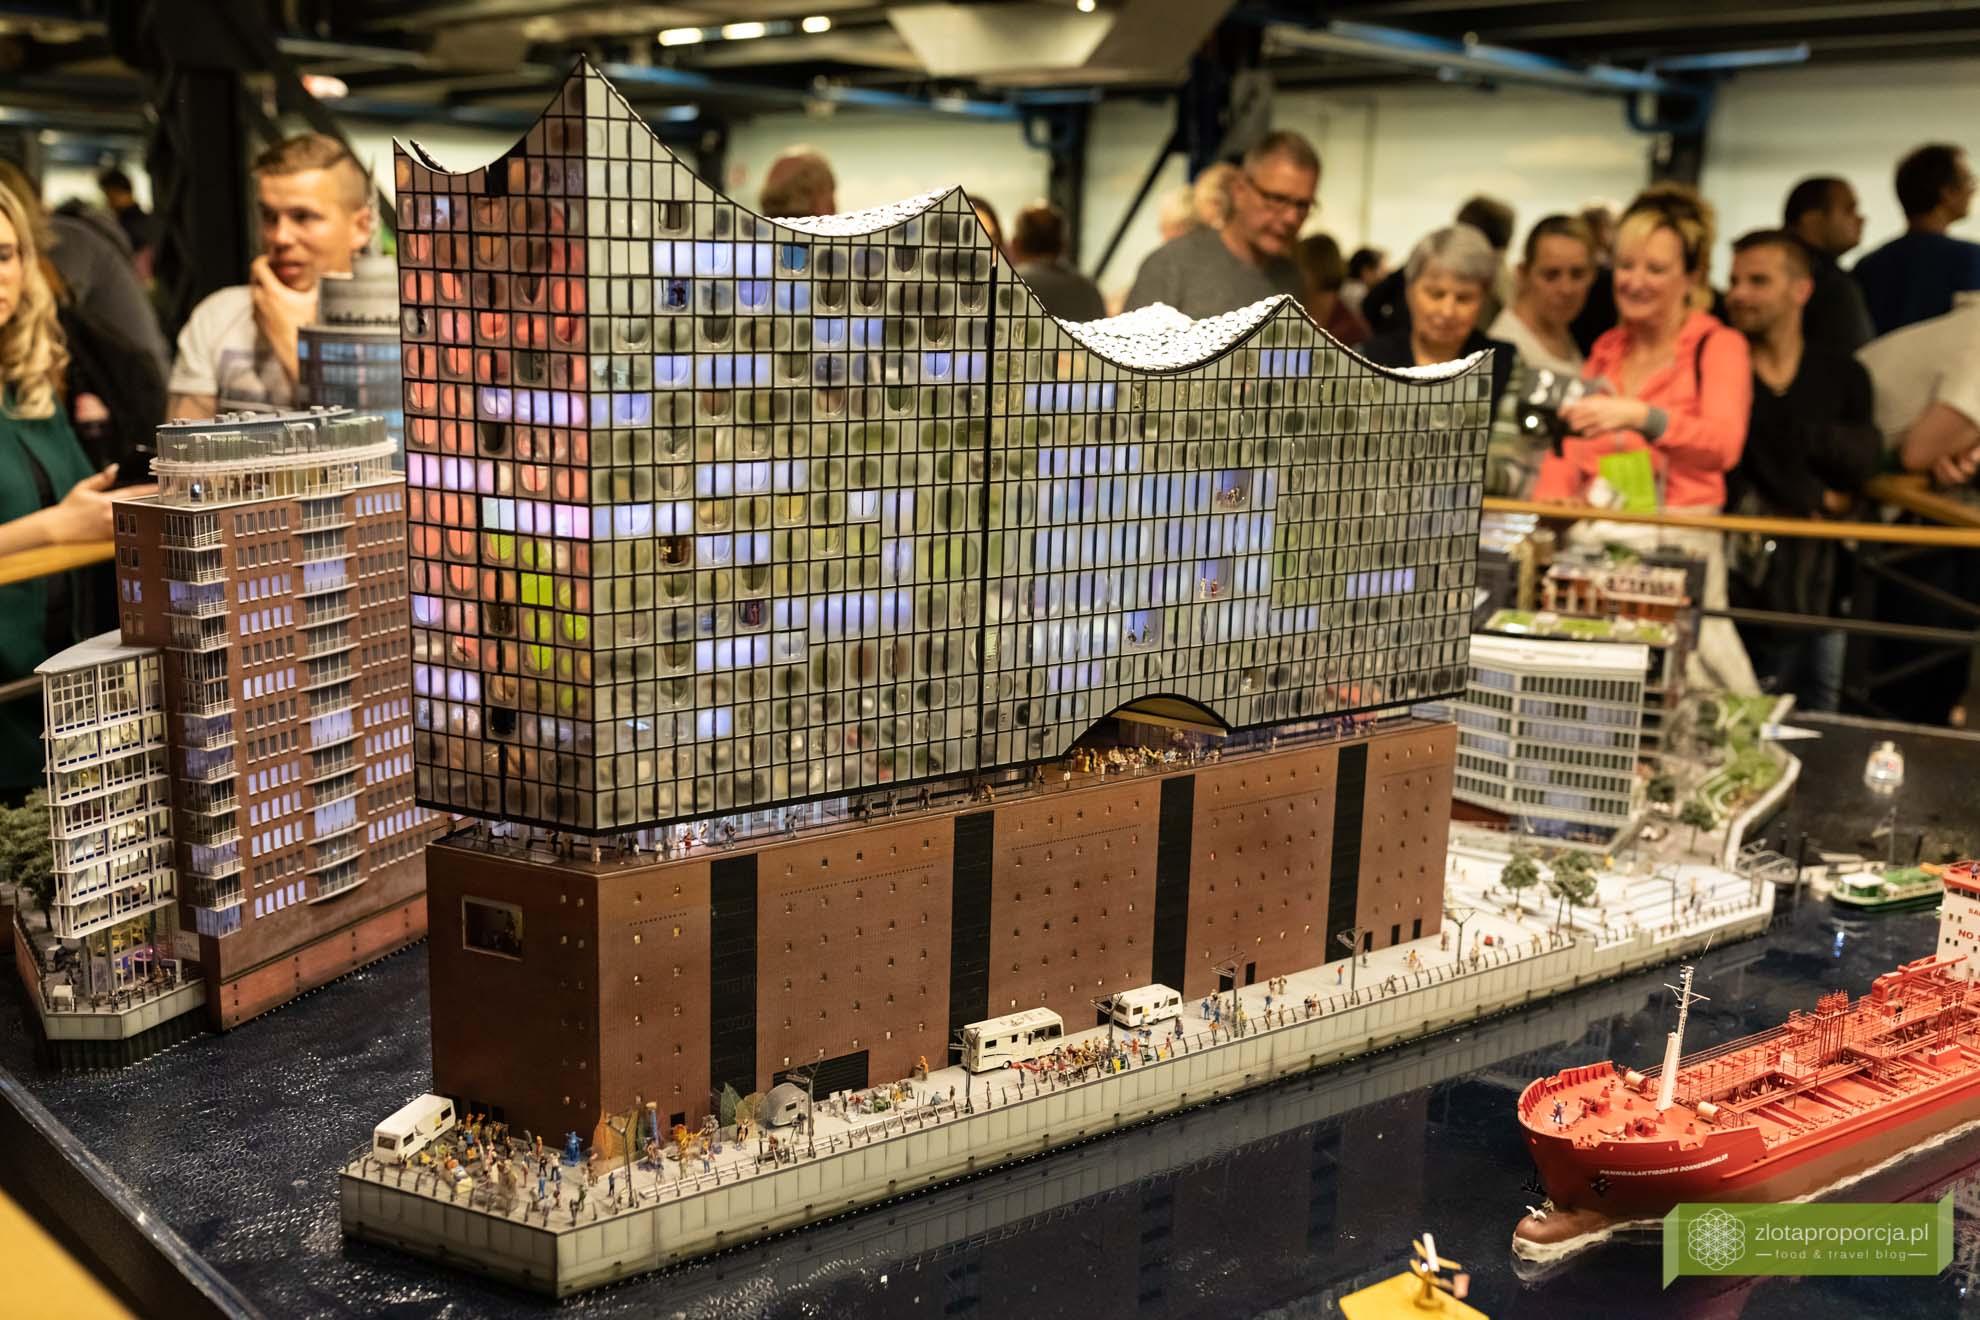 Elbphilharmonie; Hamburg, atrakcje Hamburga, HafenCity; elbphilharmonie w hamburgu; filharmonia w Hamburgu; Niemcy; atrakcje Niemiec; Miniatur Wunderland